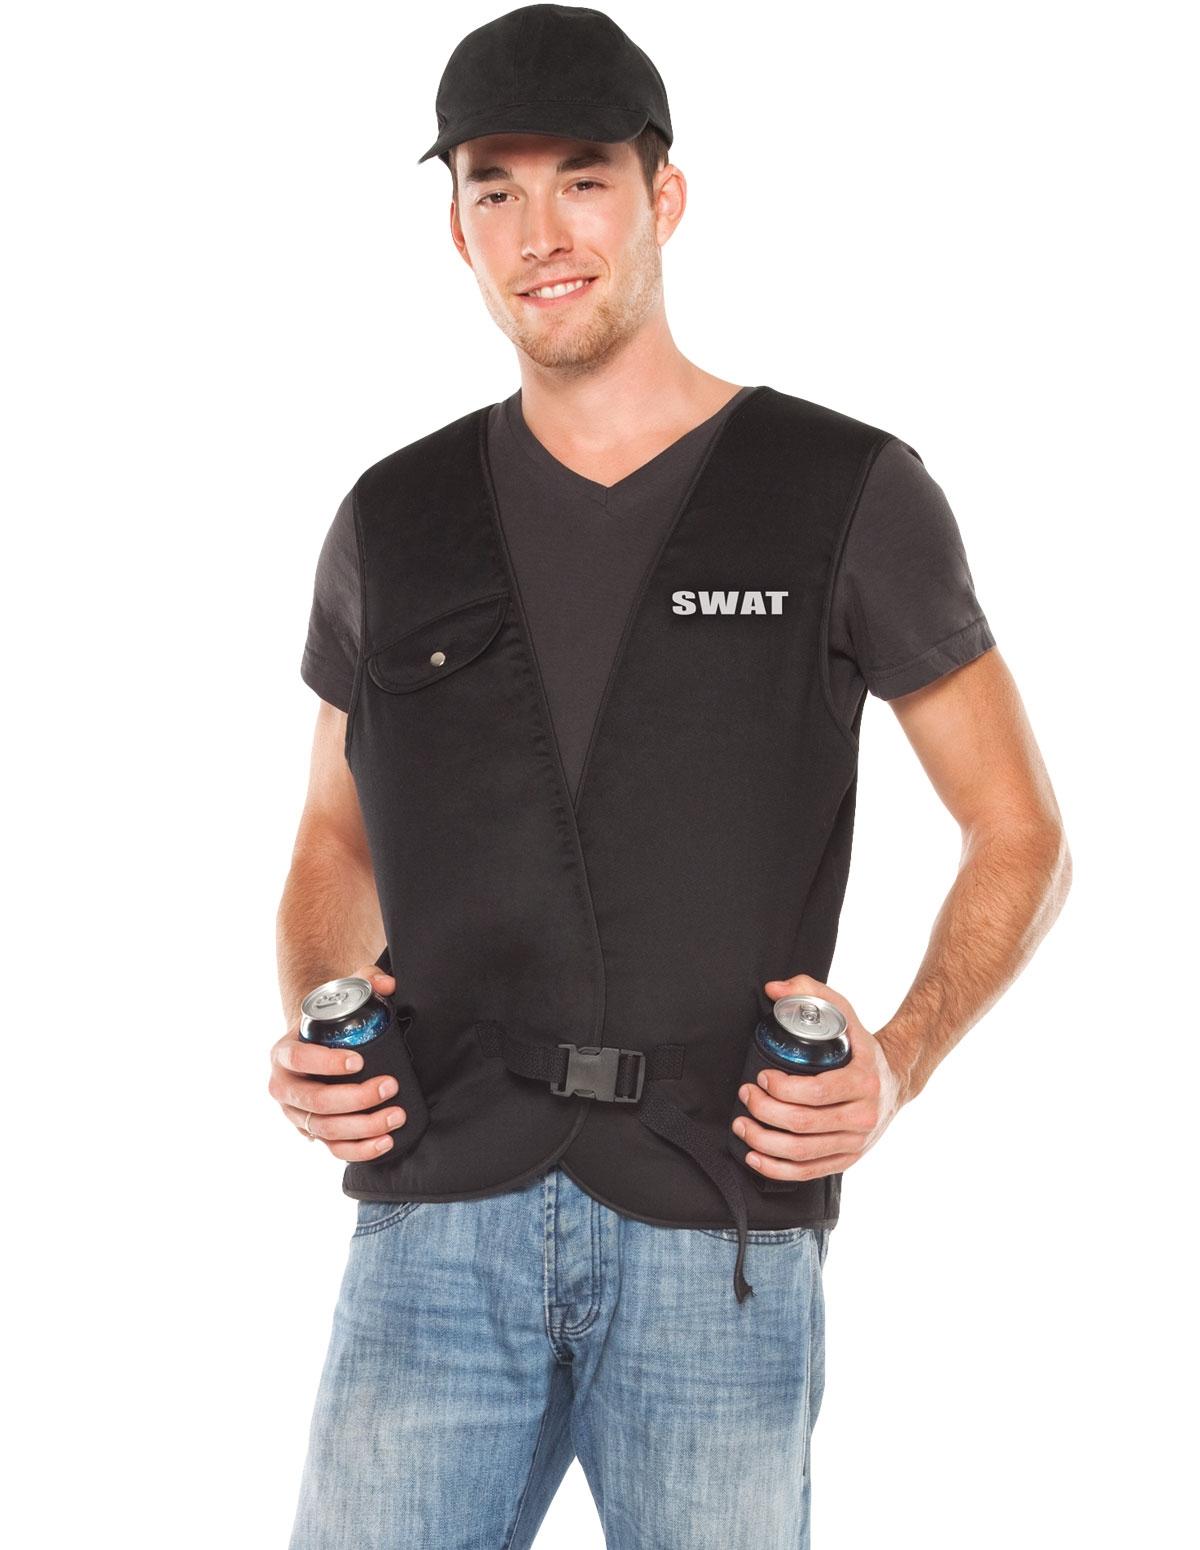 2Pc Swat Guy Costume